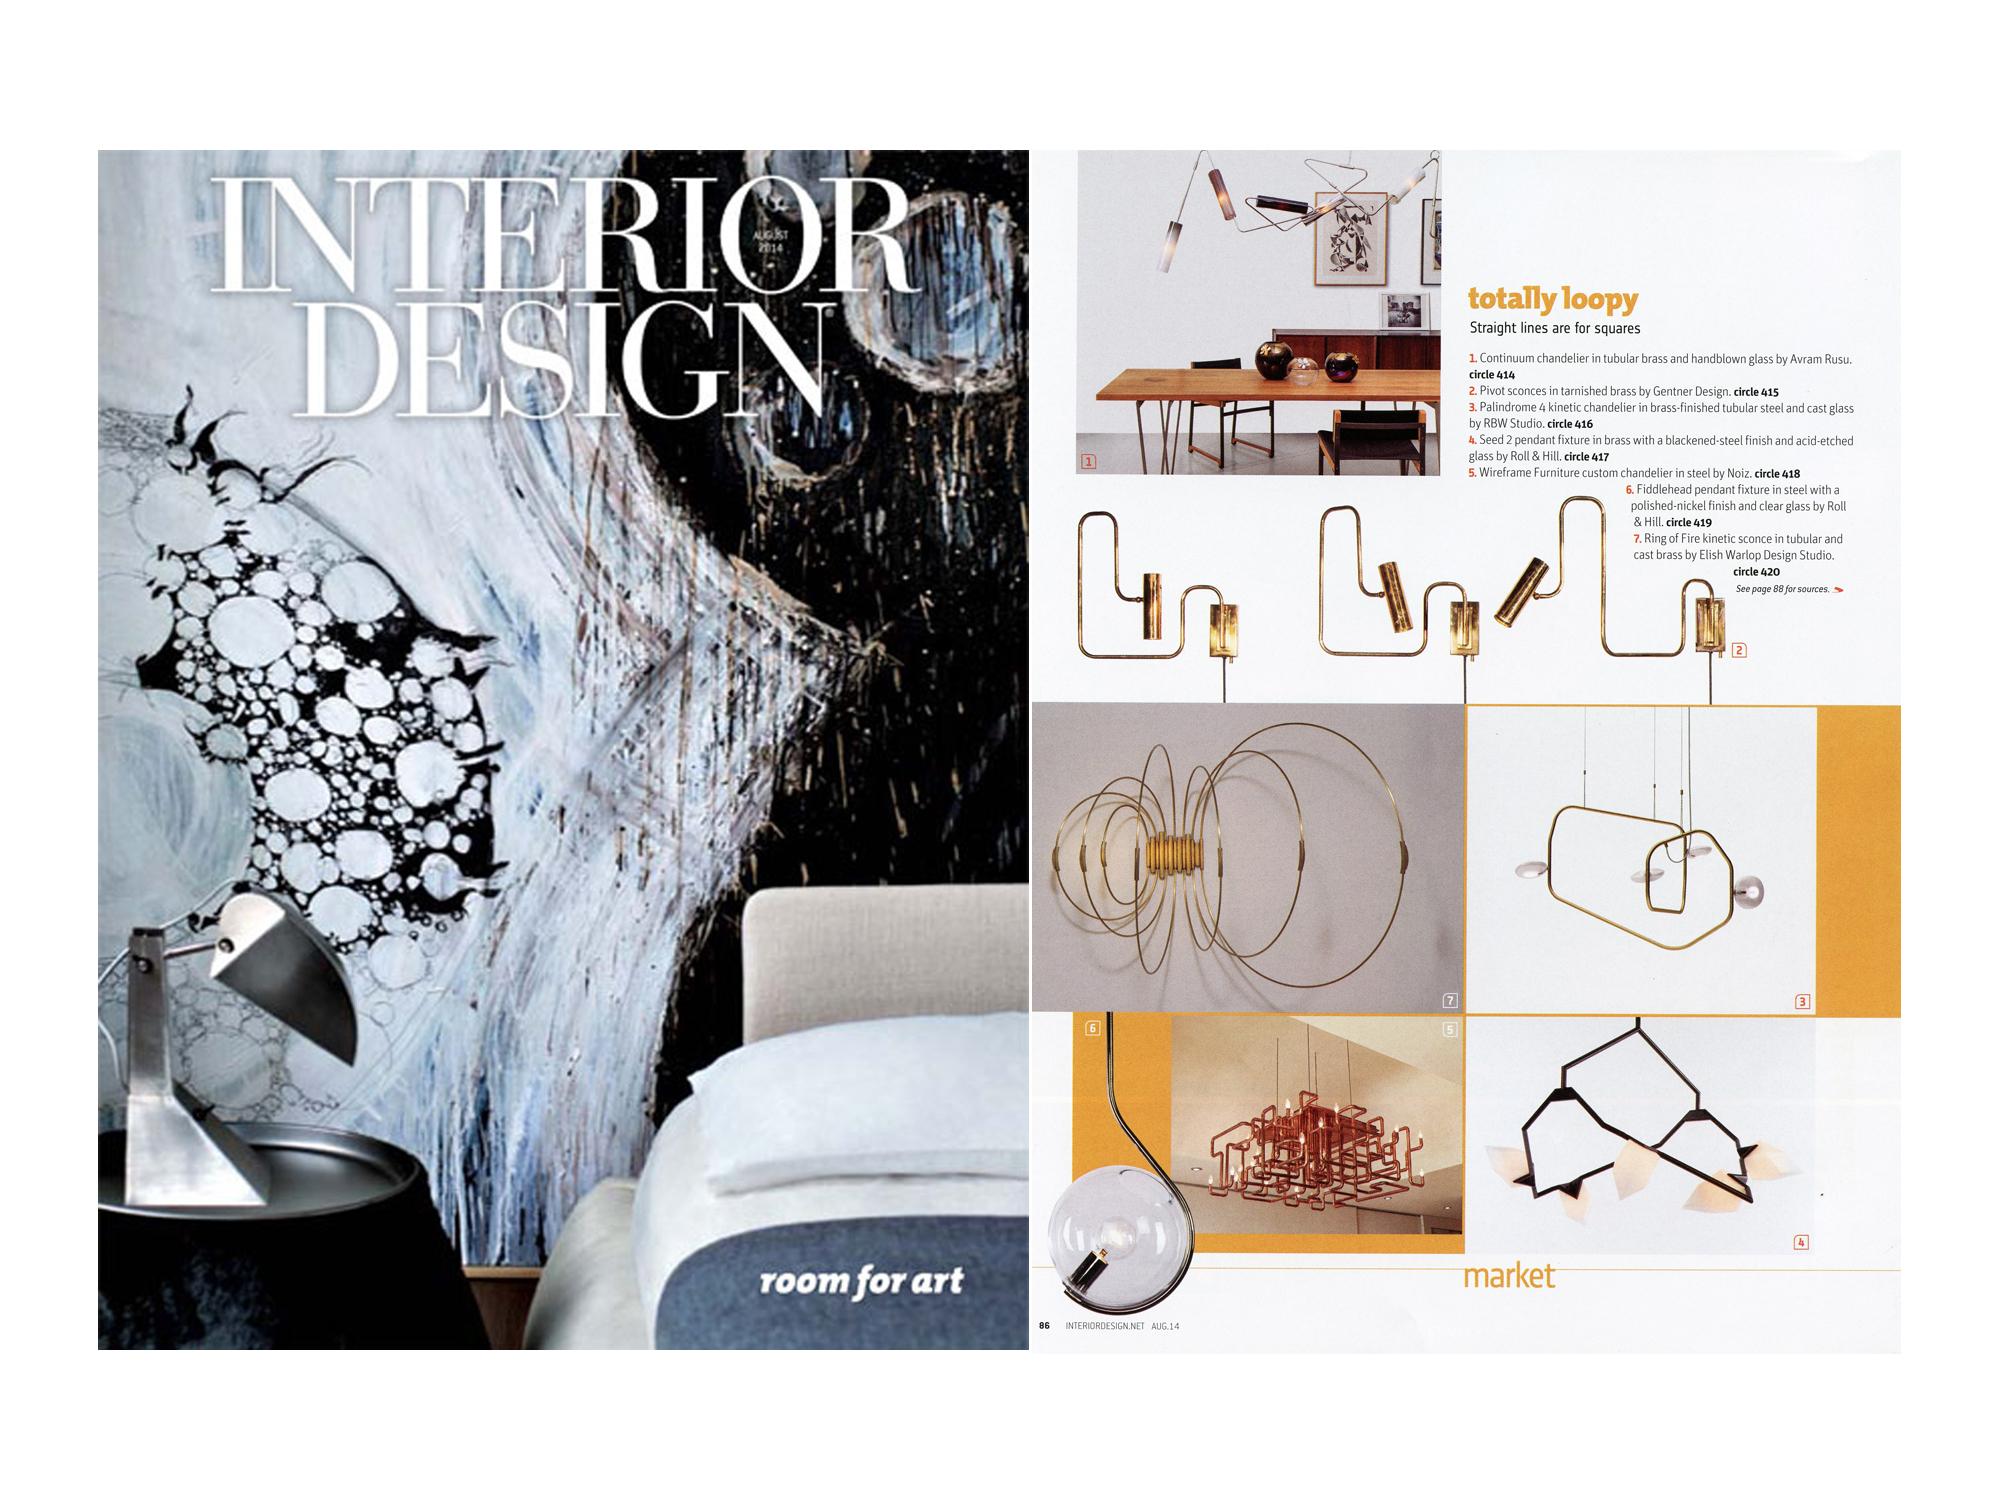 Avram_Rusu_Interior_Design_3_Press_Page.jpg